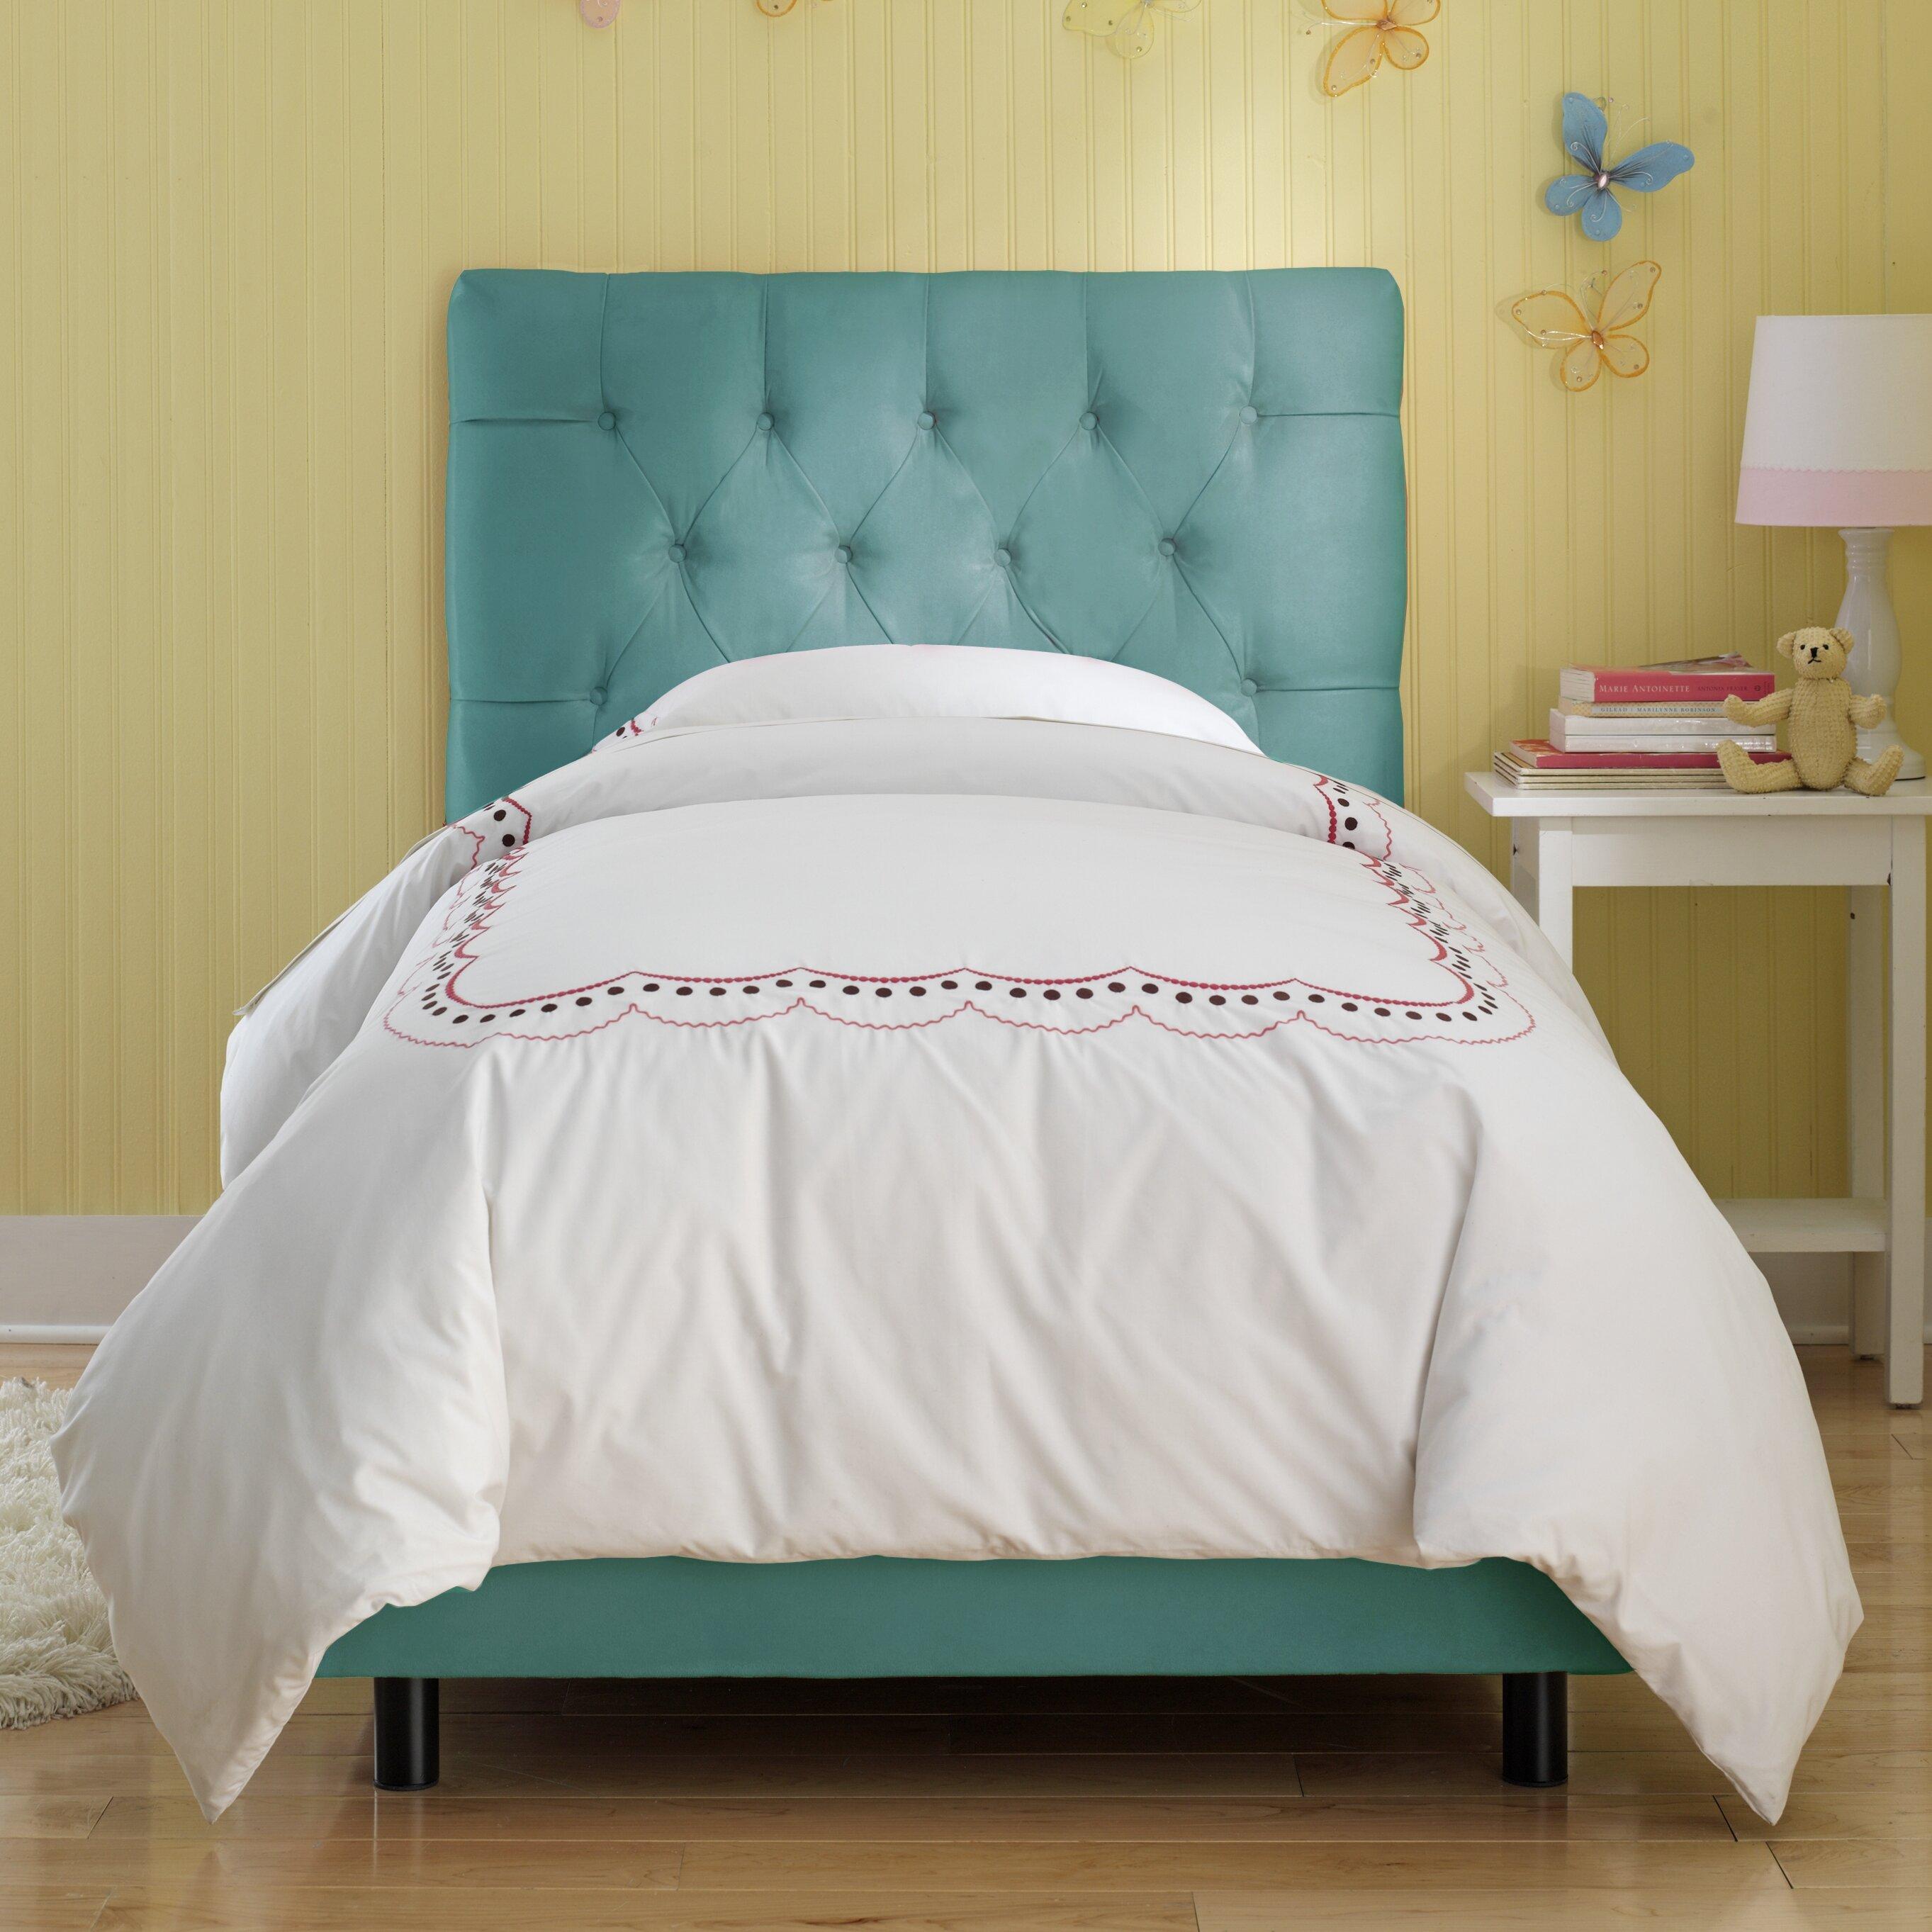 Tufted Bedroom: Skyline Furniture Tufted Panel Bed & Reviews